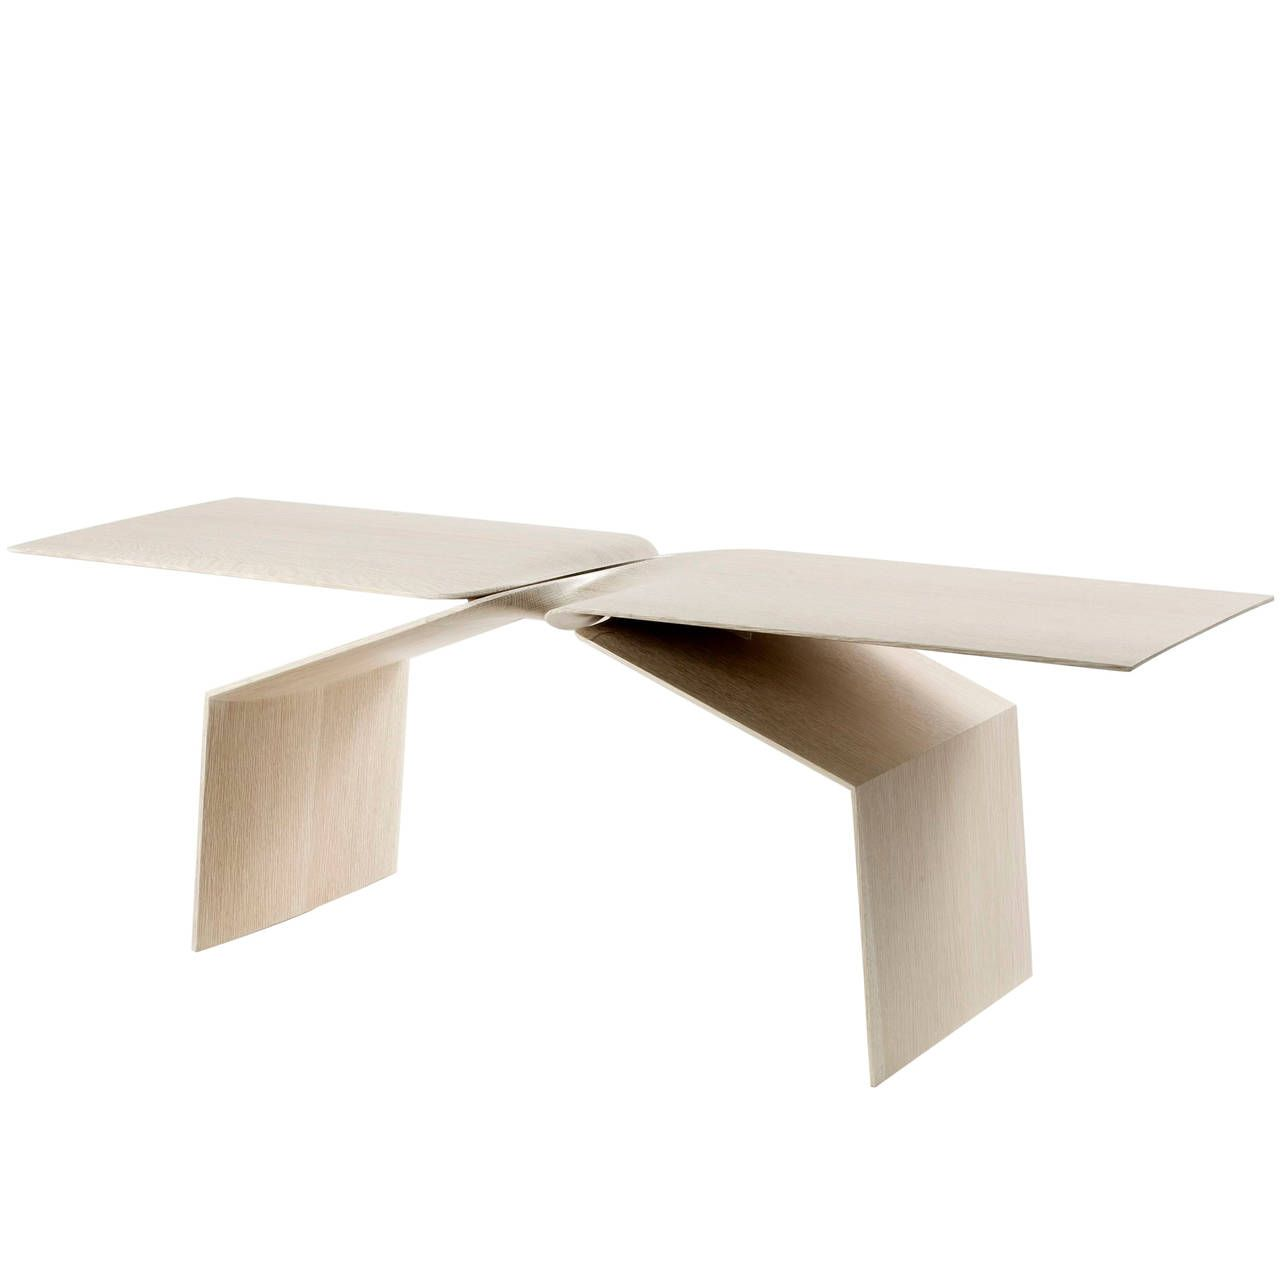 pin by gedas monginas on furniture oak coffee table table coffee rh pinterest com